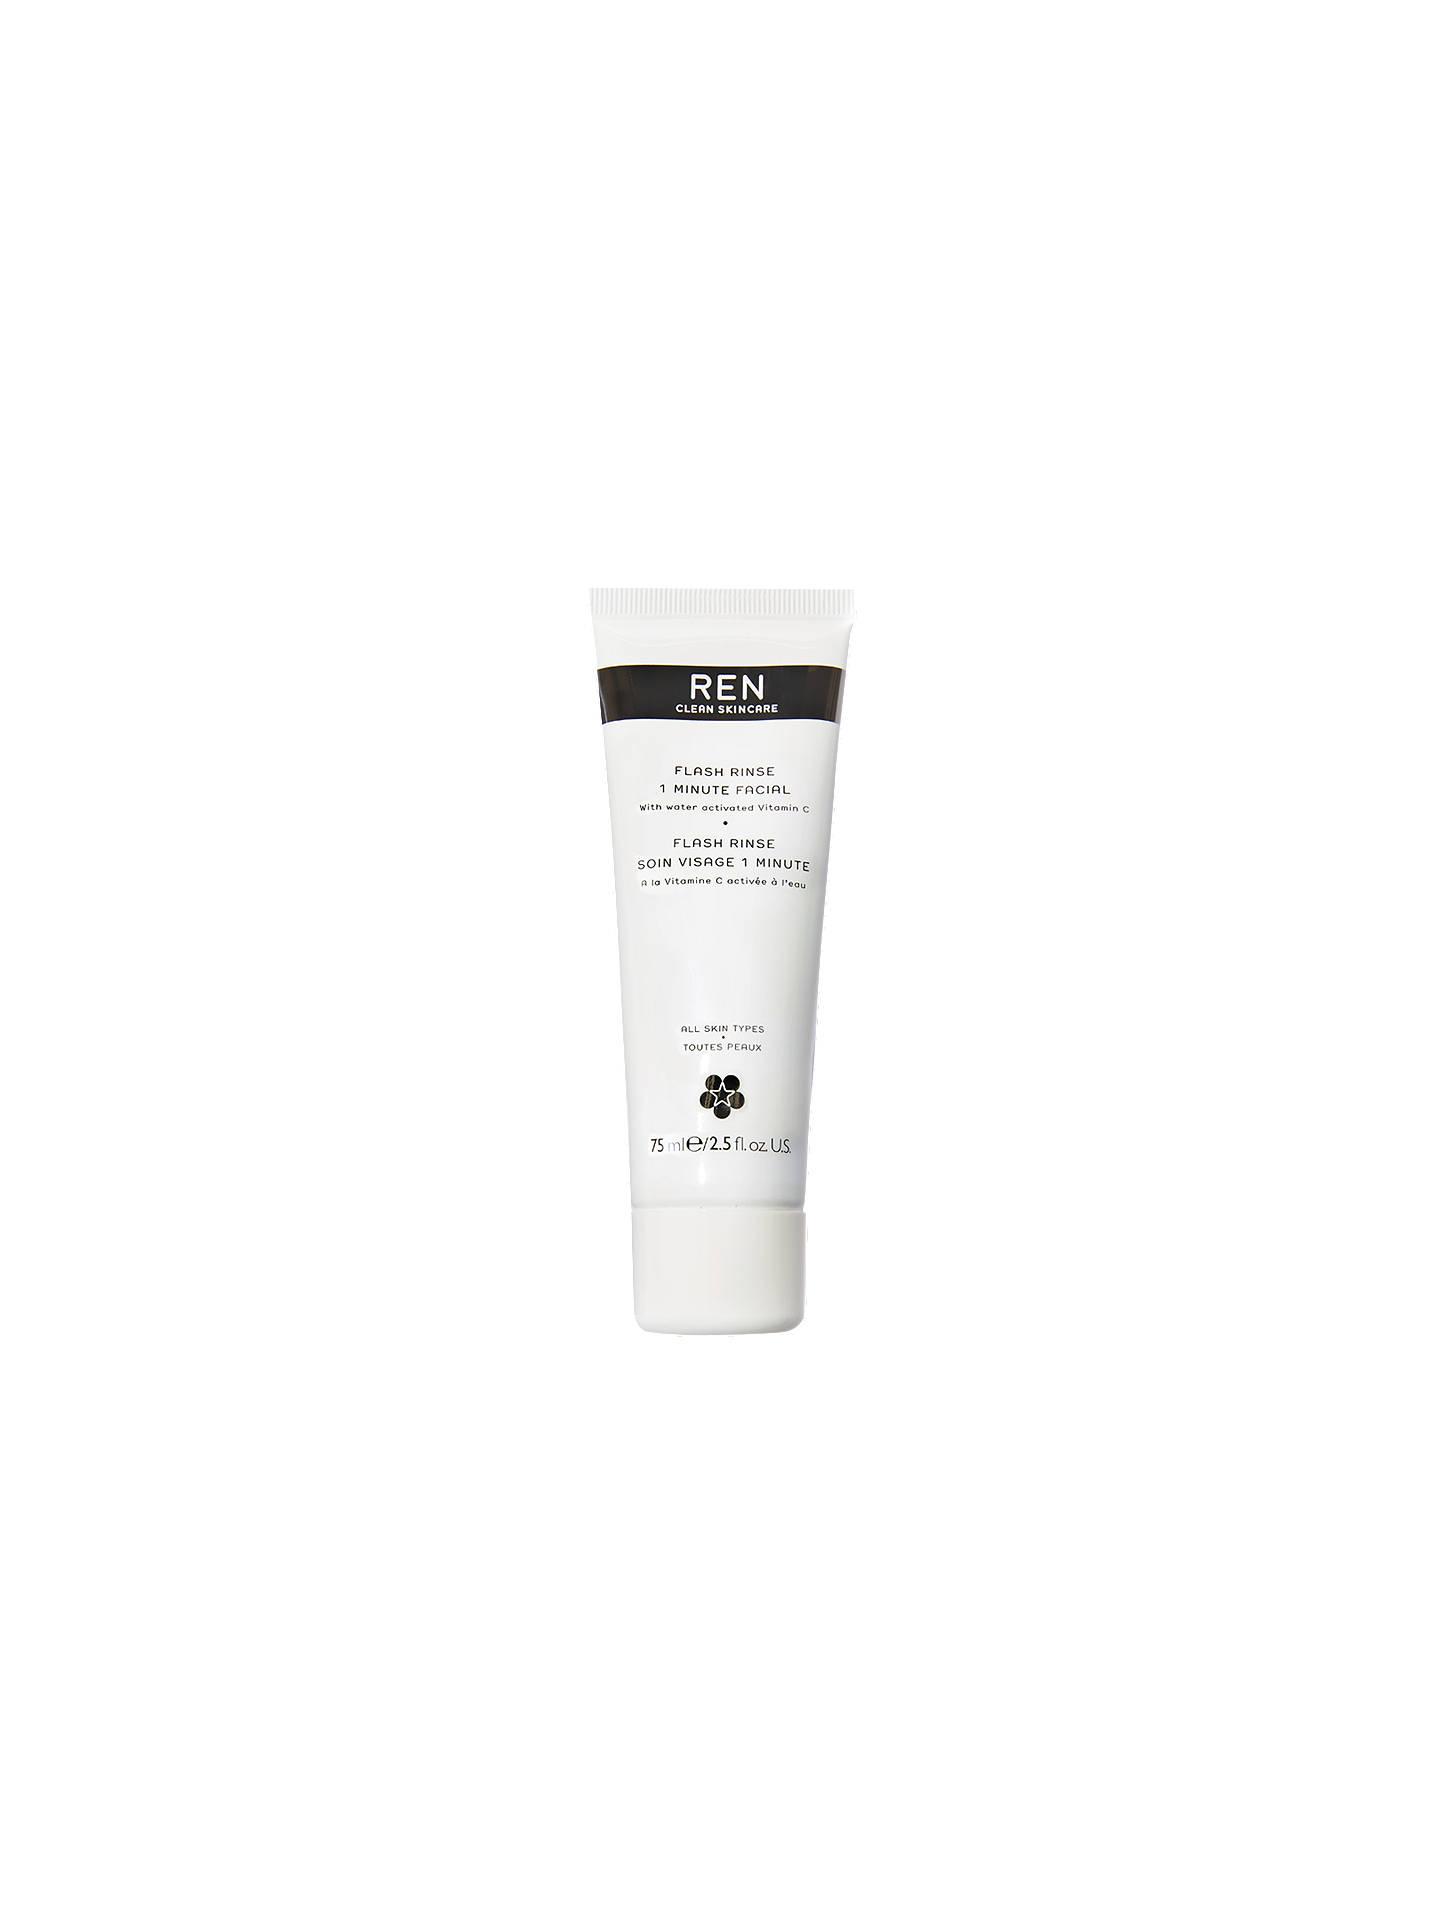 REN Flash Rinse 1 Minute Facial Treatment, 75ml